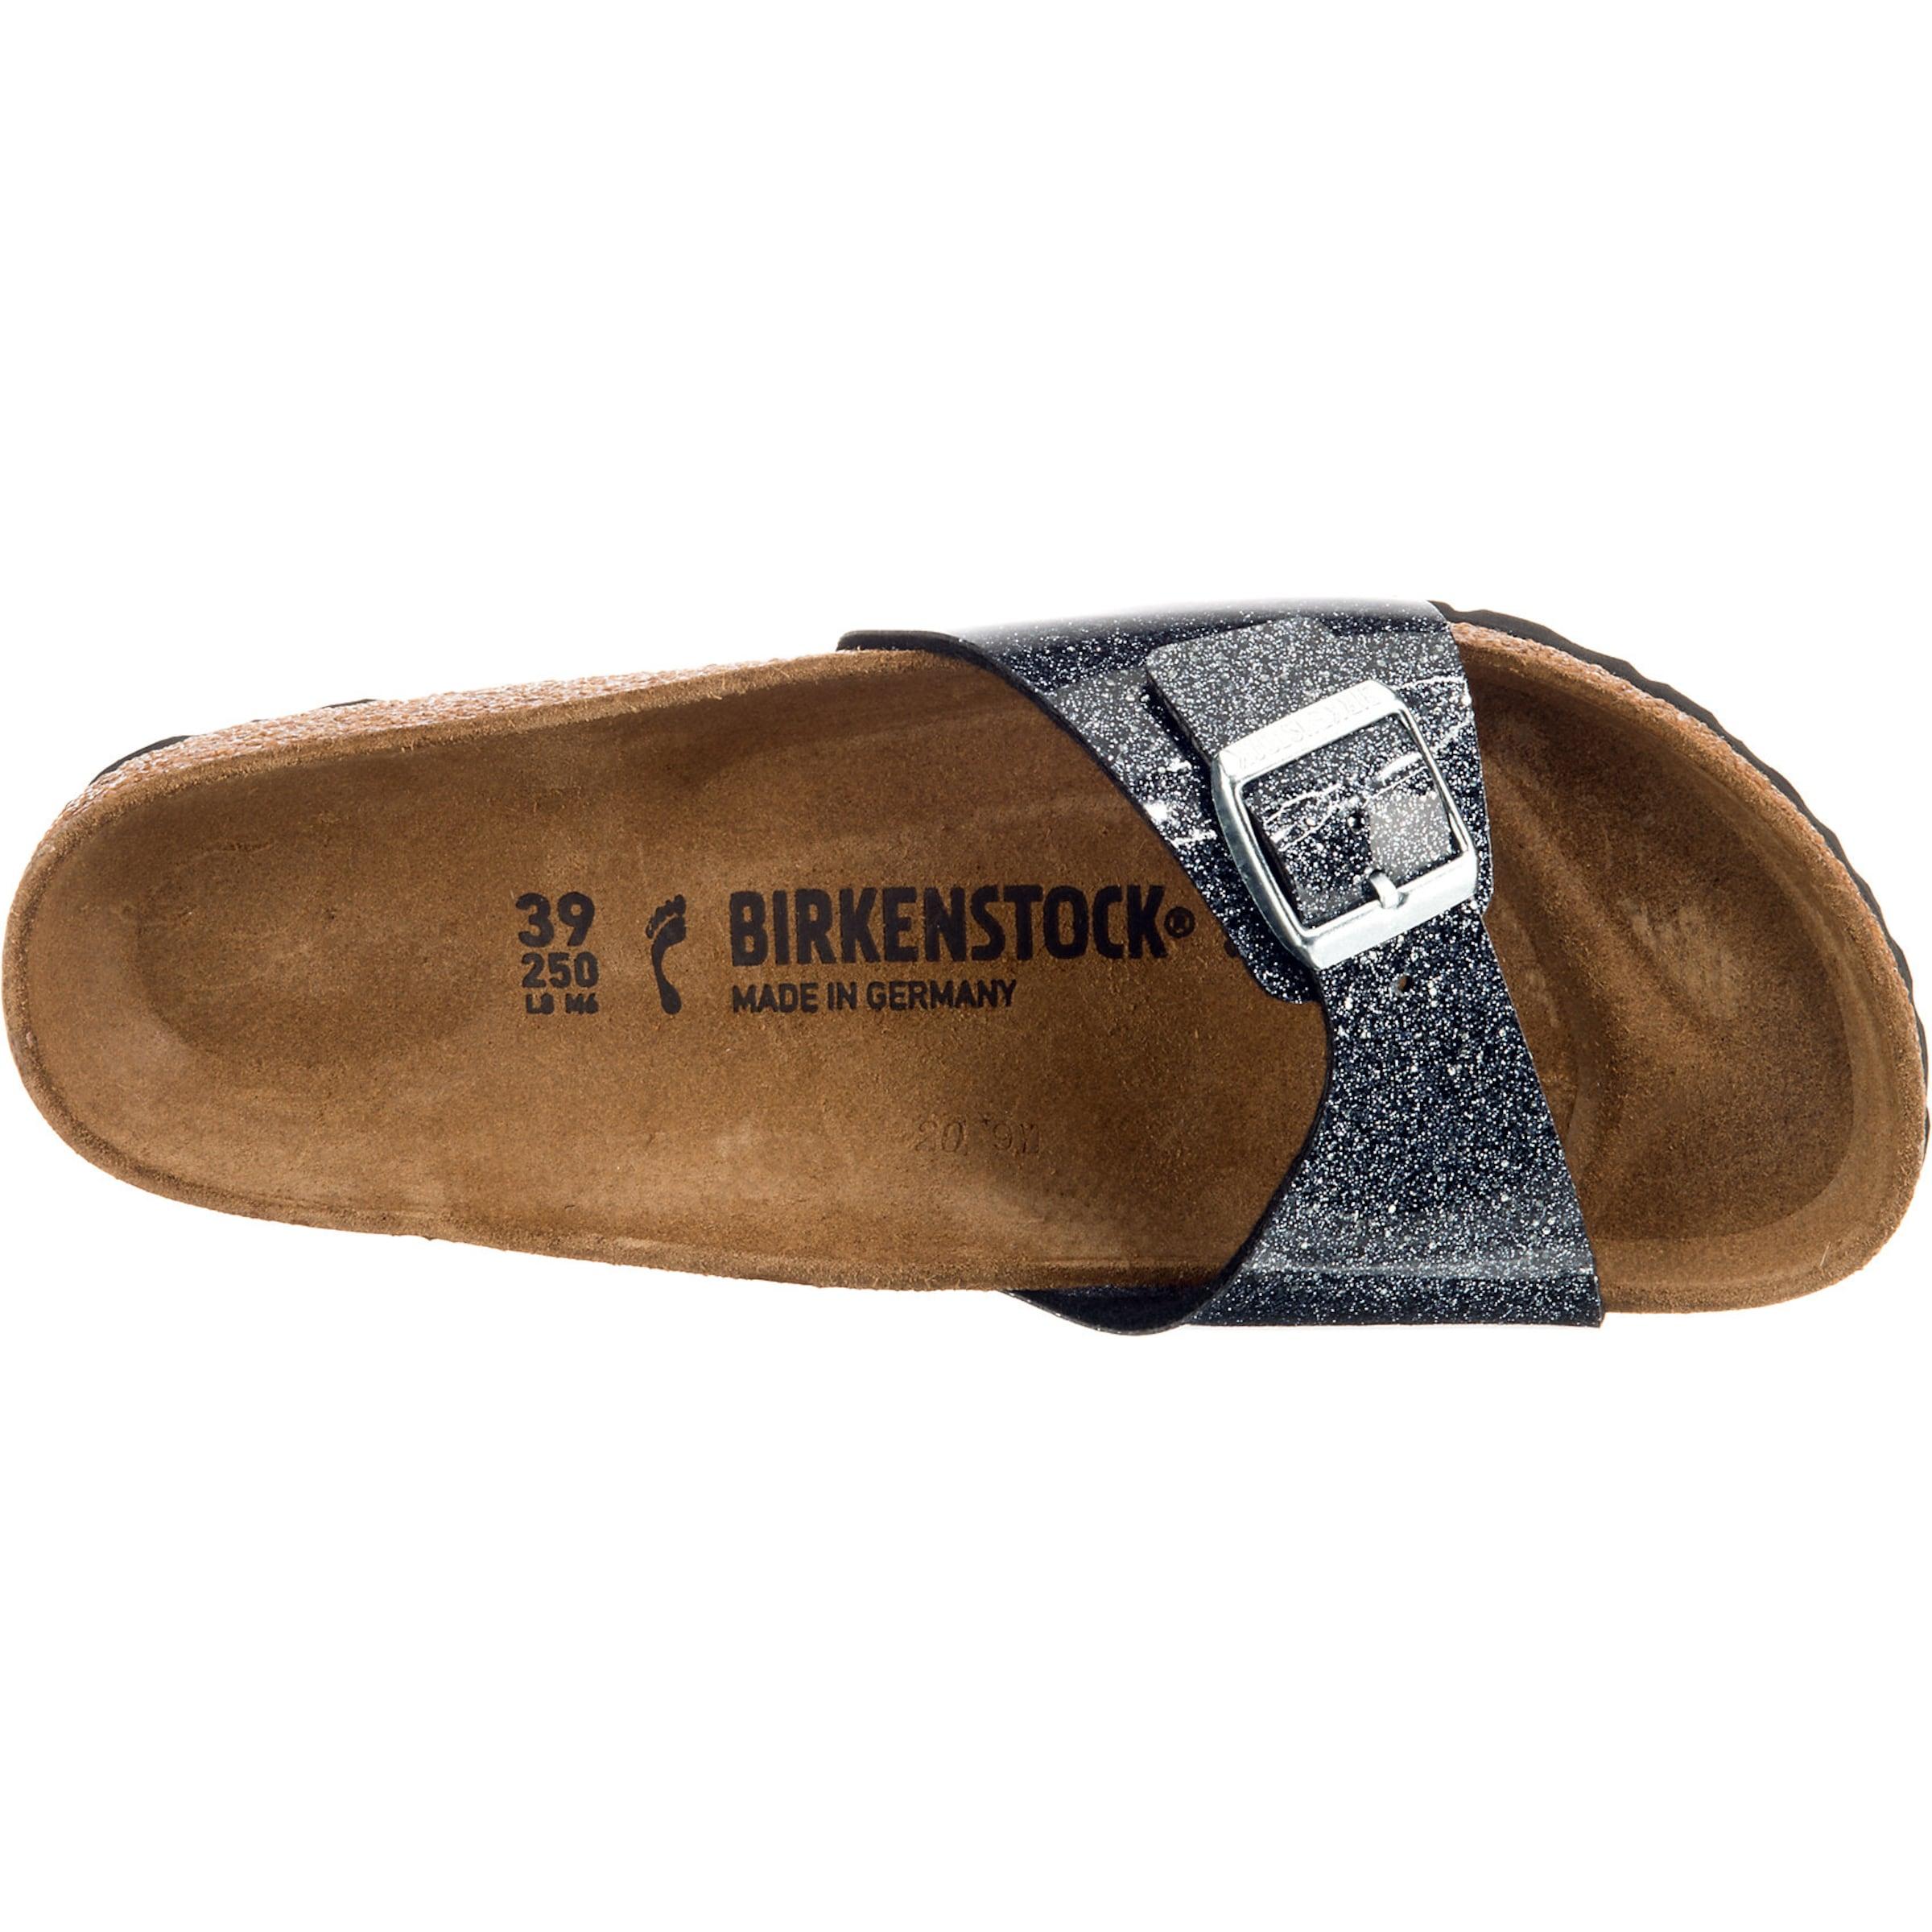 Pantolette 'madrid Birkenstock Cosmic Sparcle' In Grau 3R4ALqjc5S